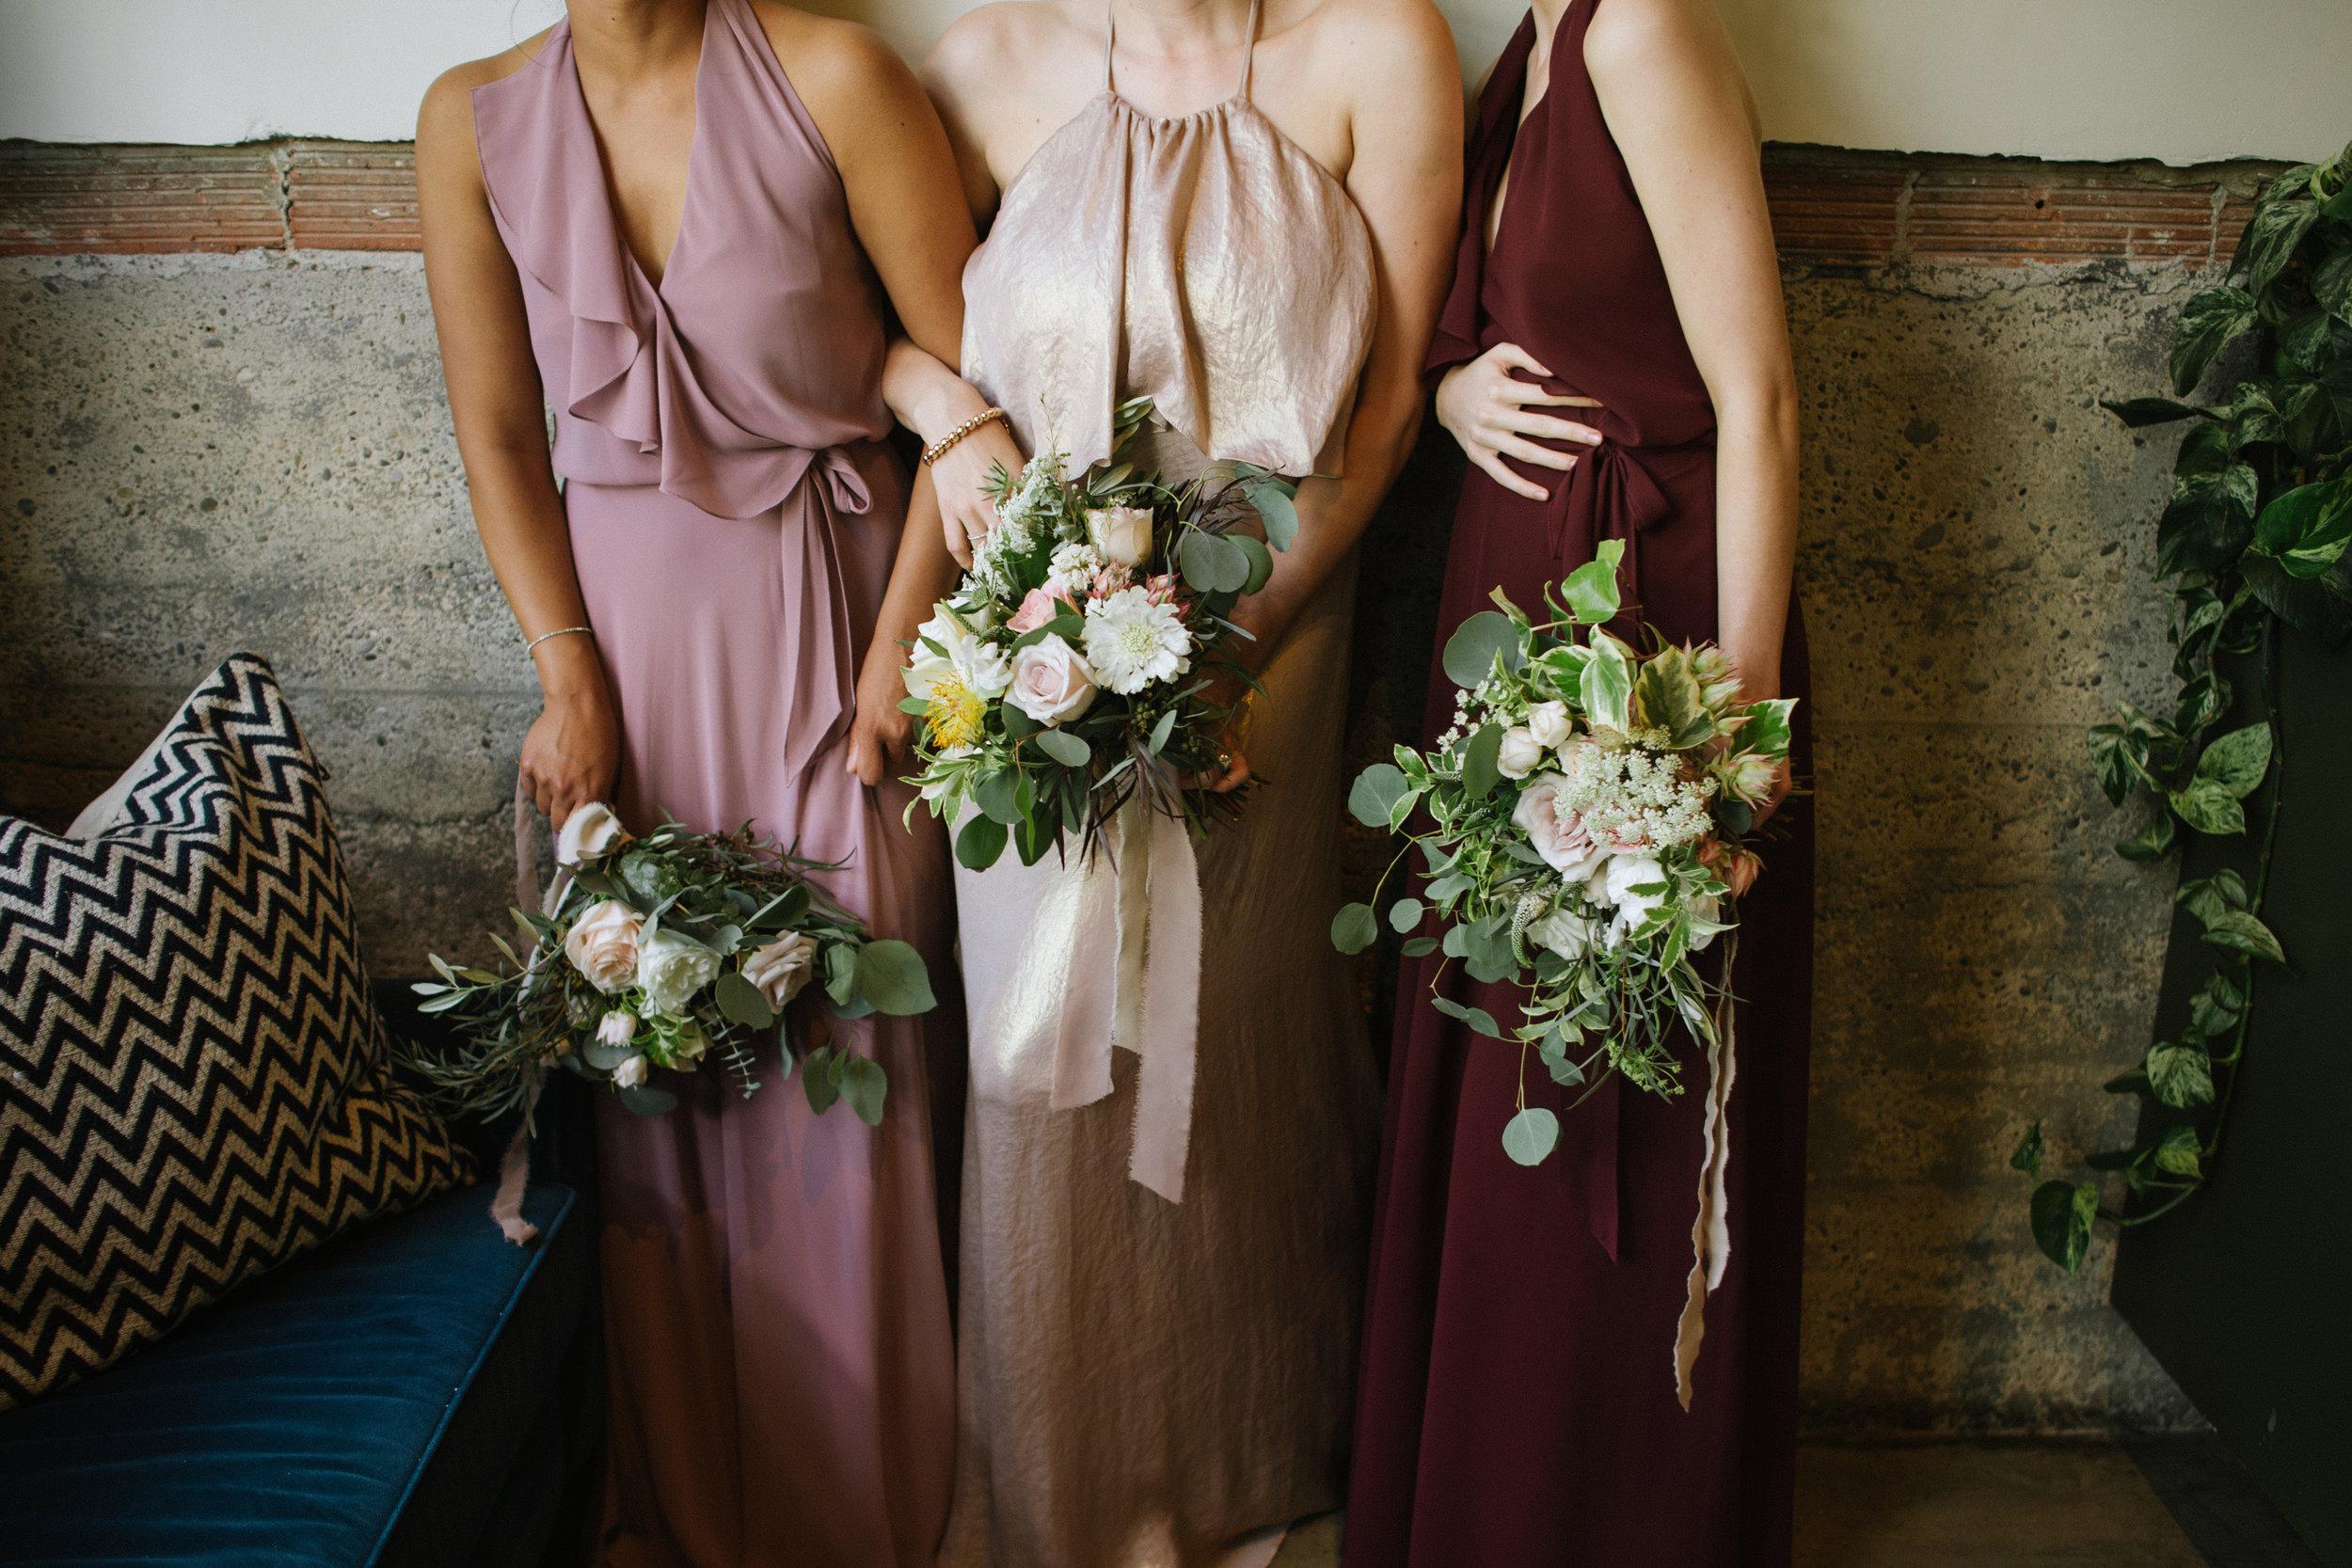 Calgary_Wedding_Photography_Bridgette_Bar_Bridesmaids_Shoot_2018_HR088.jpg